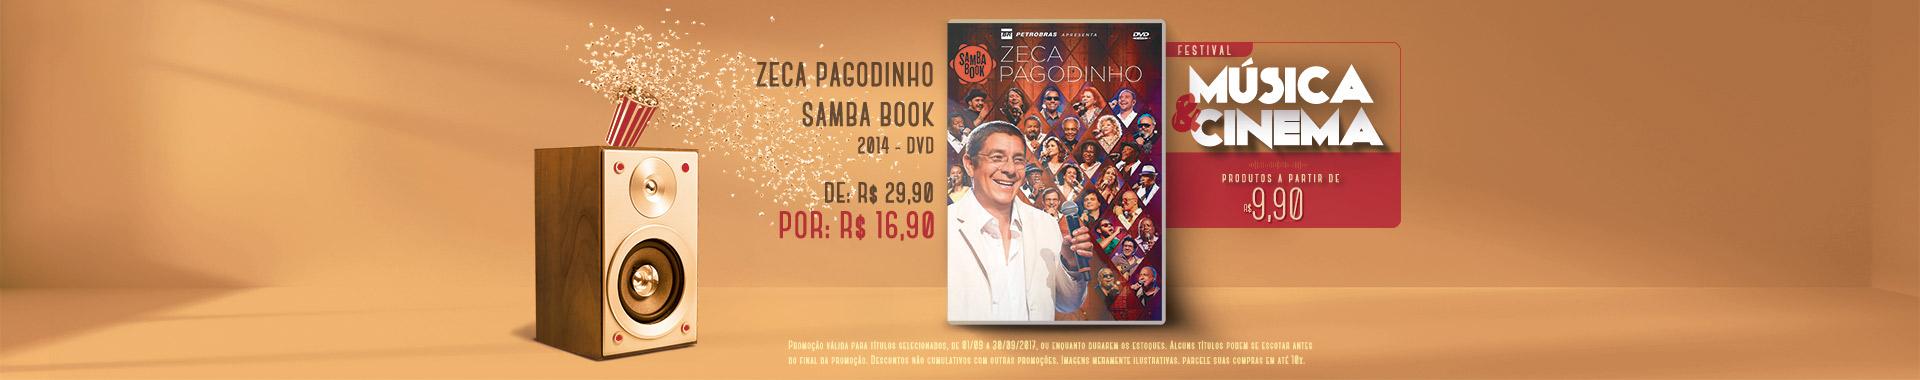 FM&C - Zéca Pagodinho